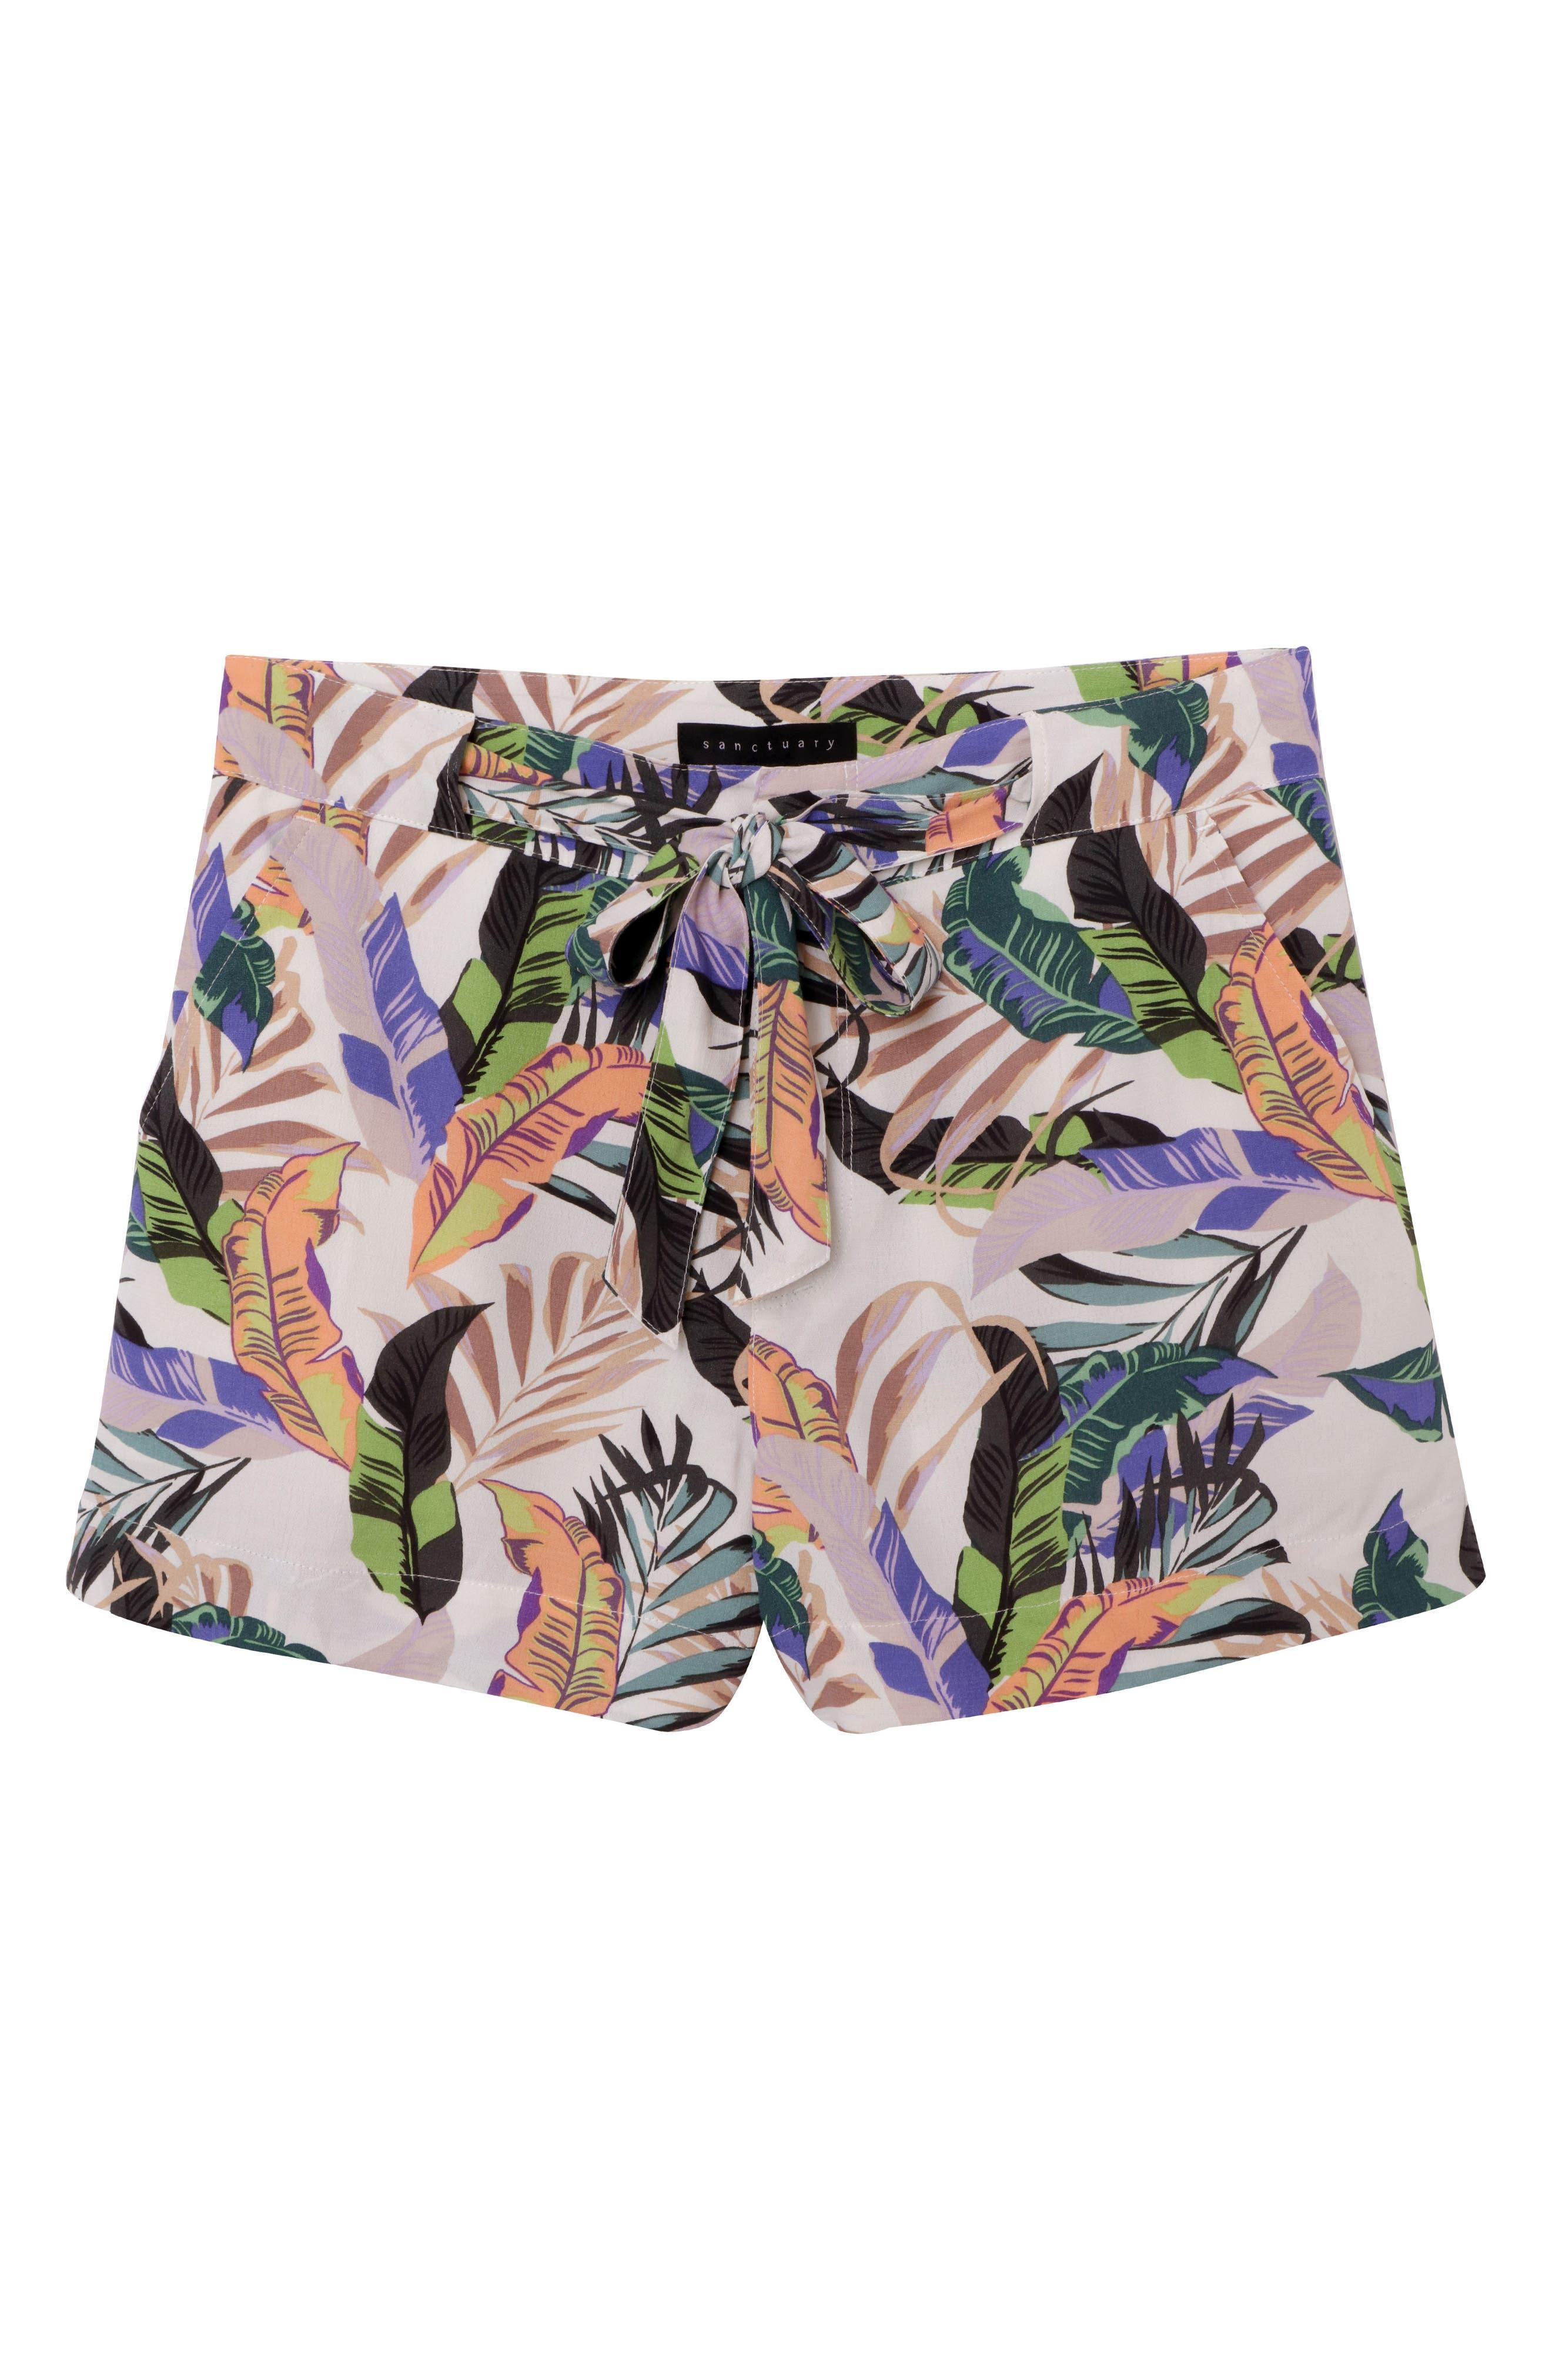 Wild Flower Shorts,                             Alternate thumbnail 5, color,                             Tropics